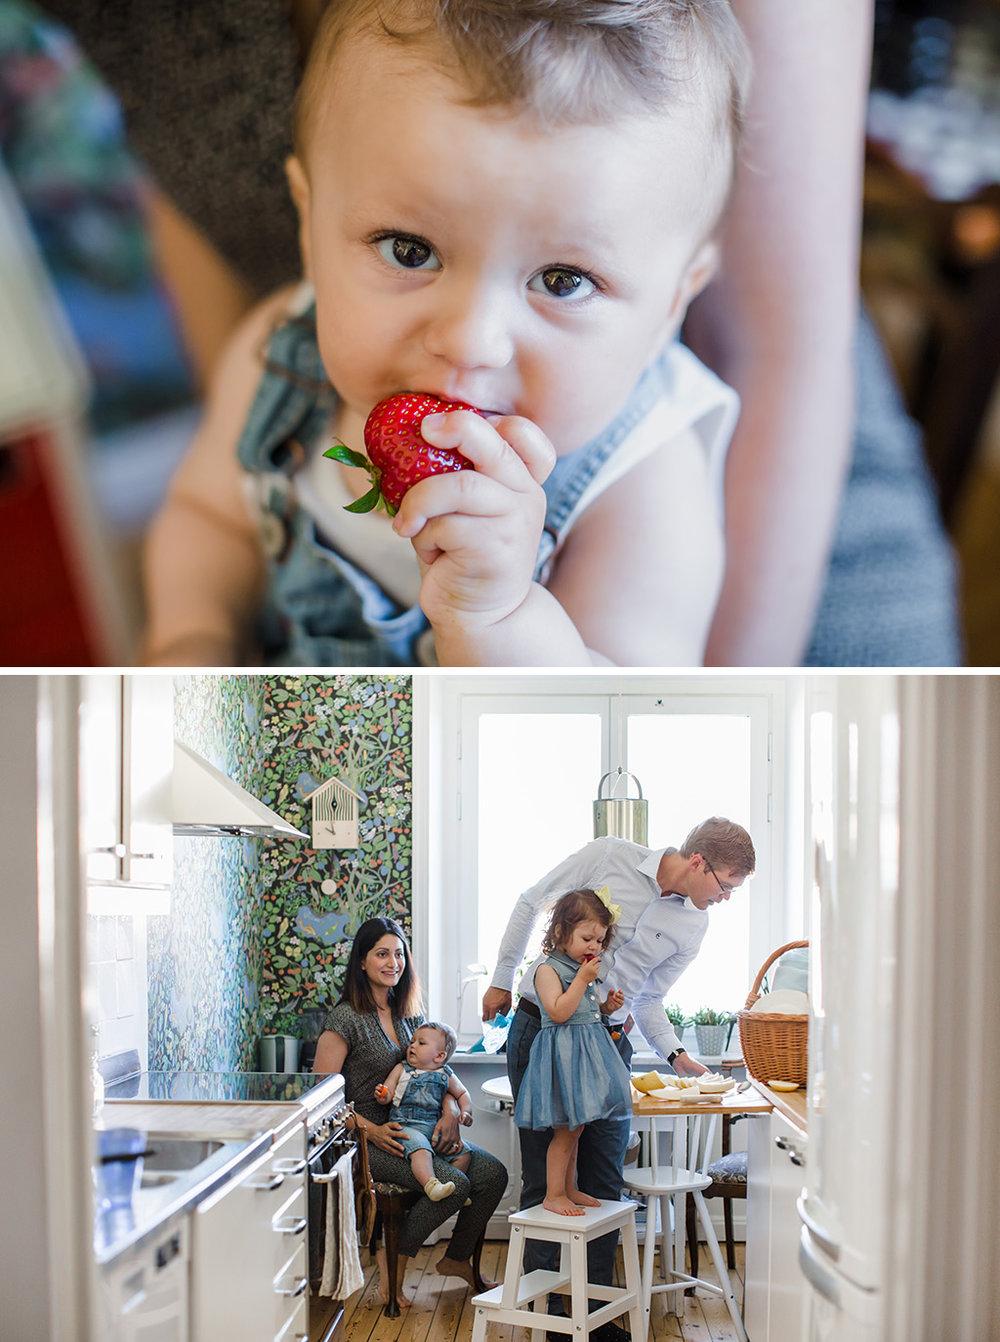 Lifestyle-hemma-hos-fotografering_familjefotograf-Stockholm-7.jpg